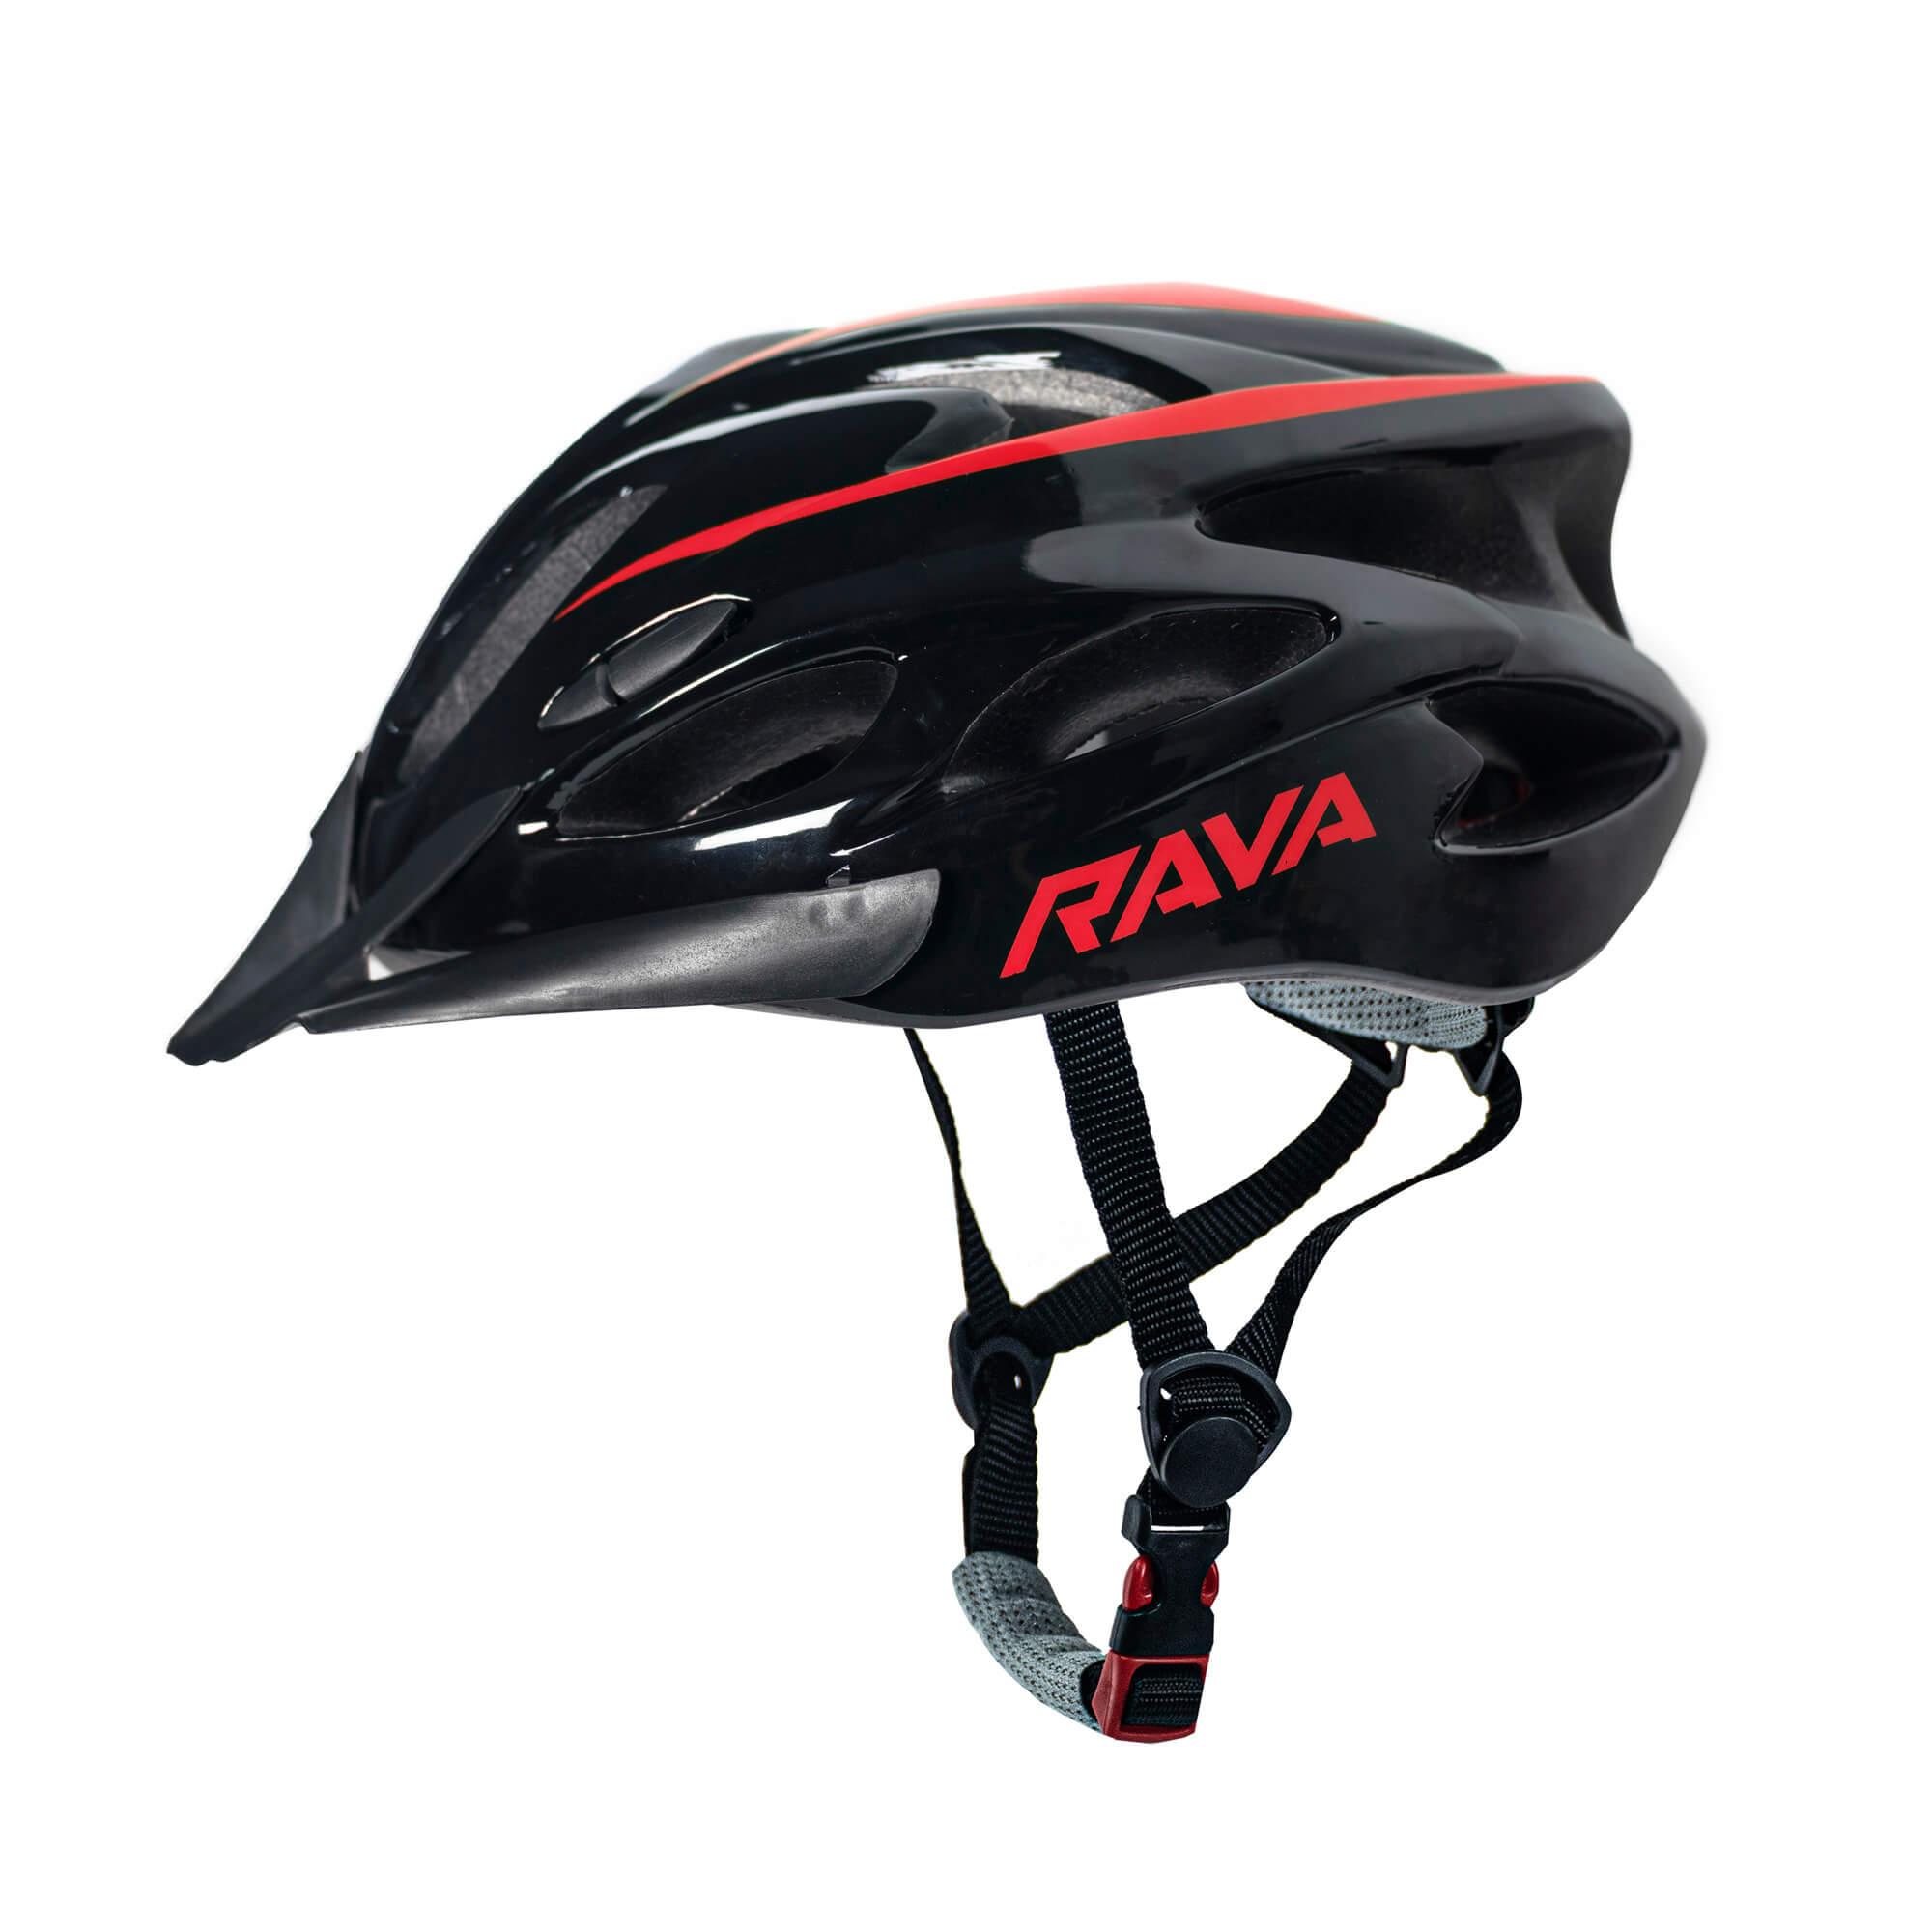 Capacete Ciclismo MTB TSW Rava New Space - Preto / Vermelho  - Calil Sport Bike